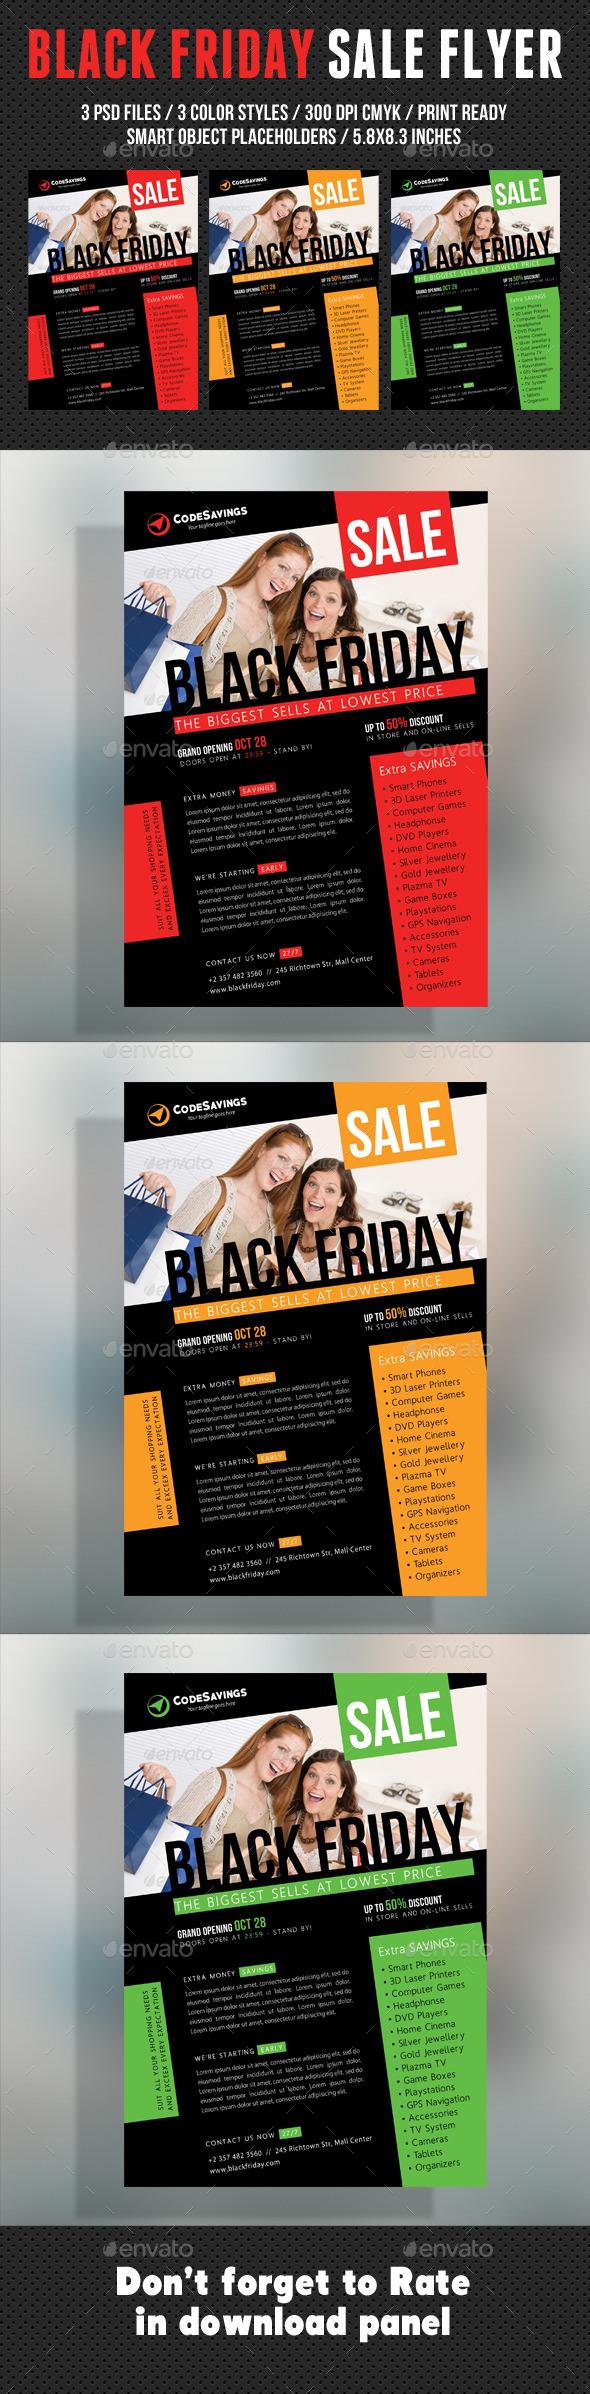 GraphicRiver Black Friday Flyer V03 9500586